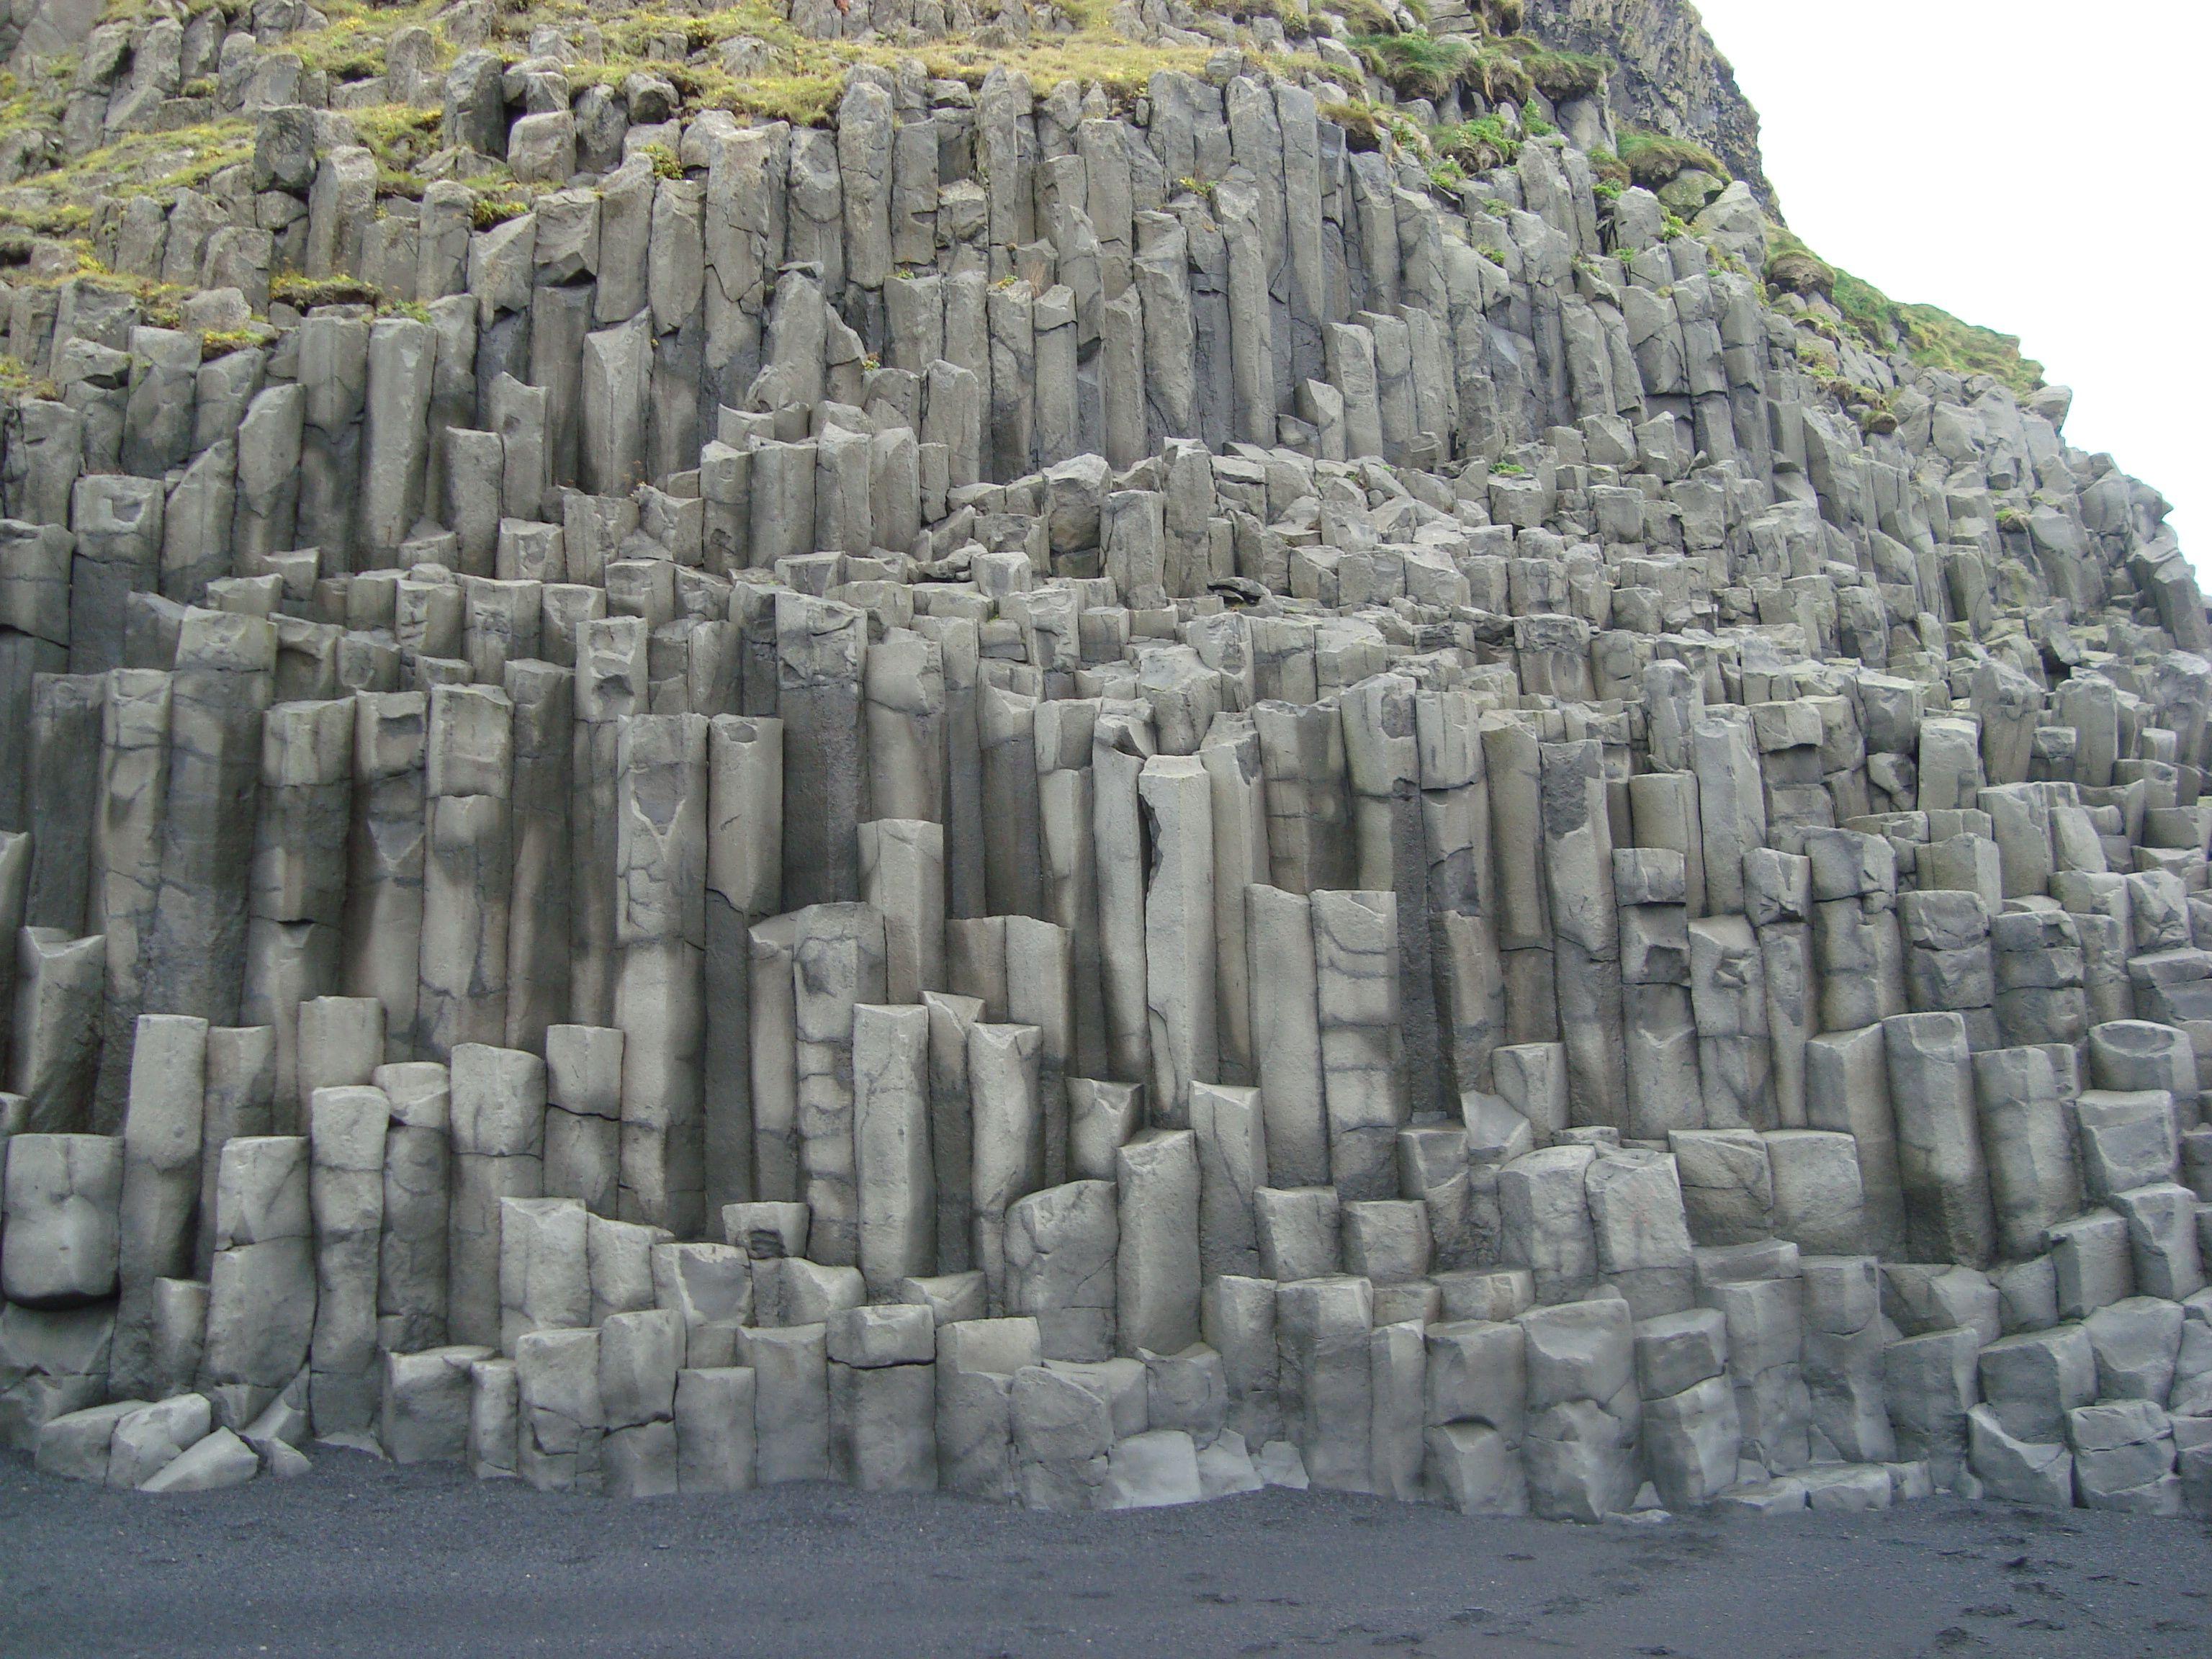 basalt fields in iceland - Google Search | Vacation Spots ...